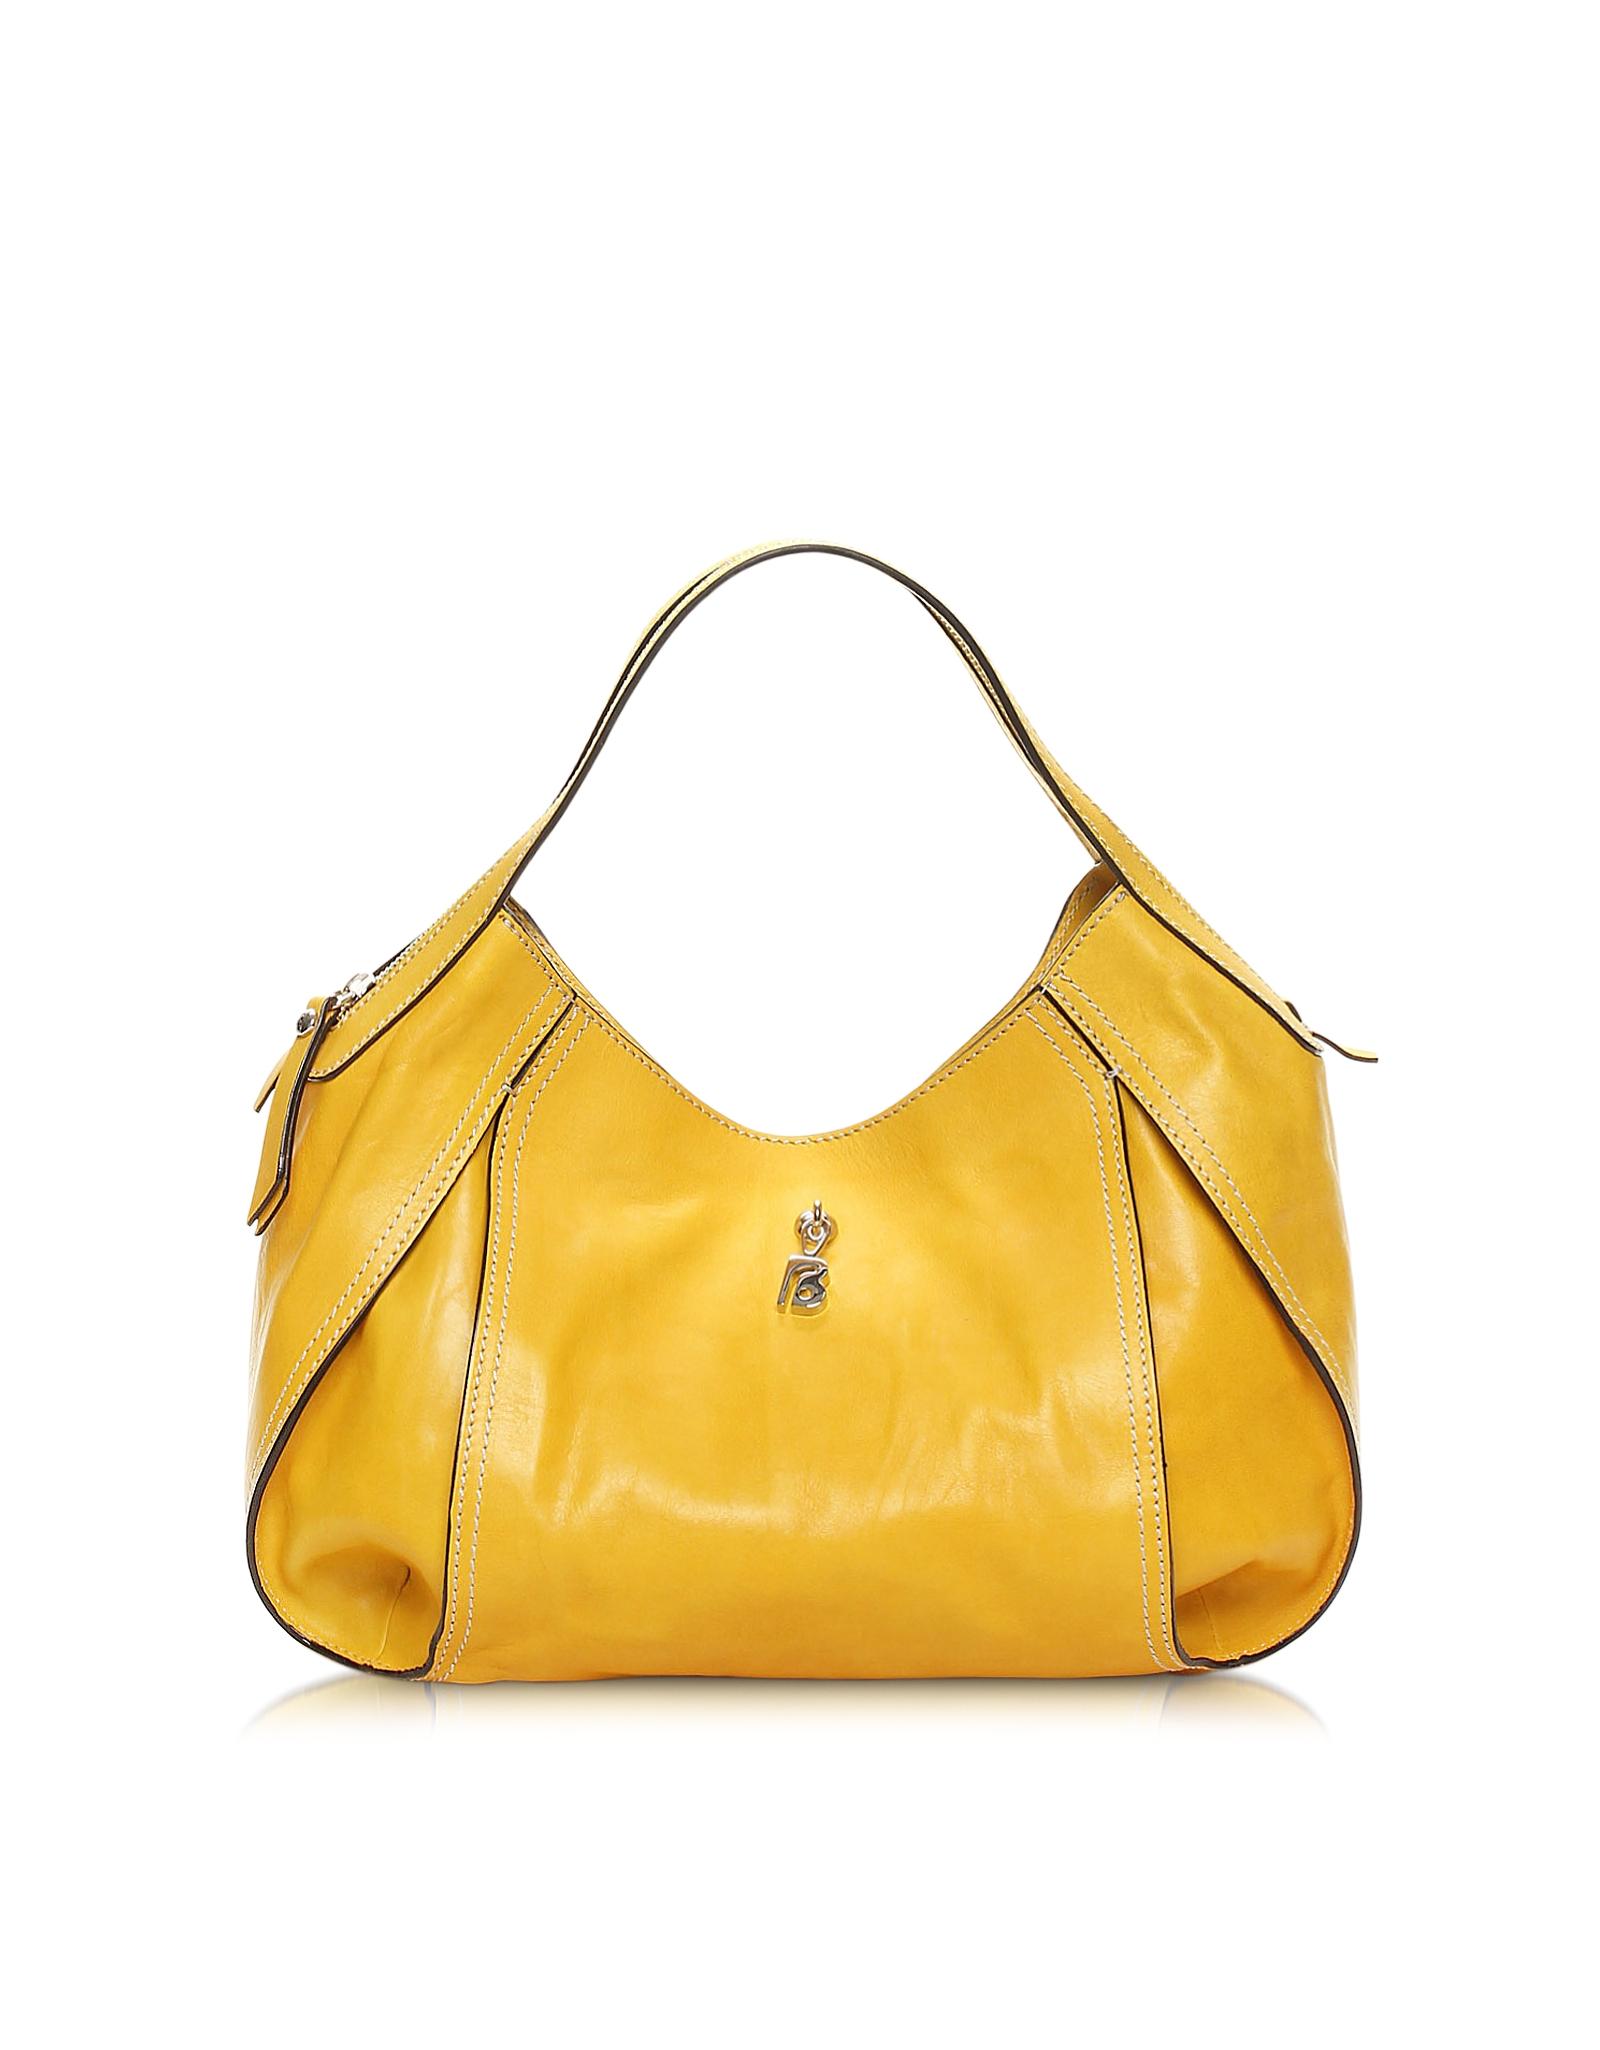 Francesco biasia Copacabana Amber Yellow Leather Shoulder Bag in ...